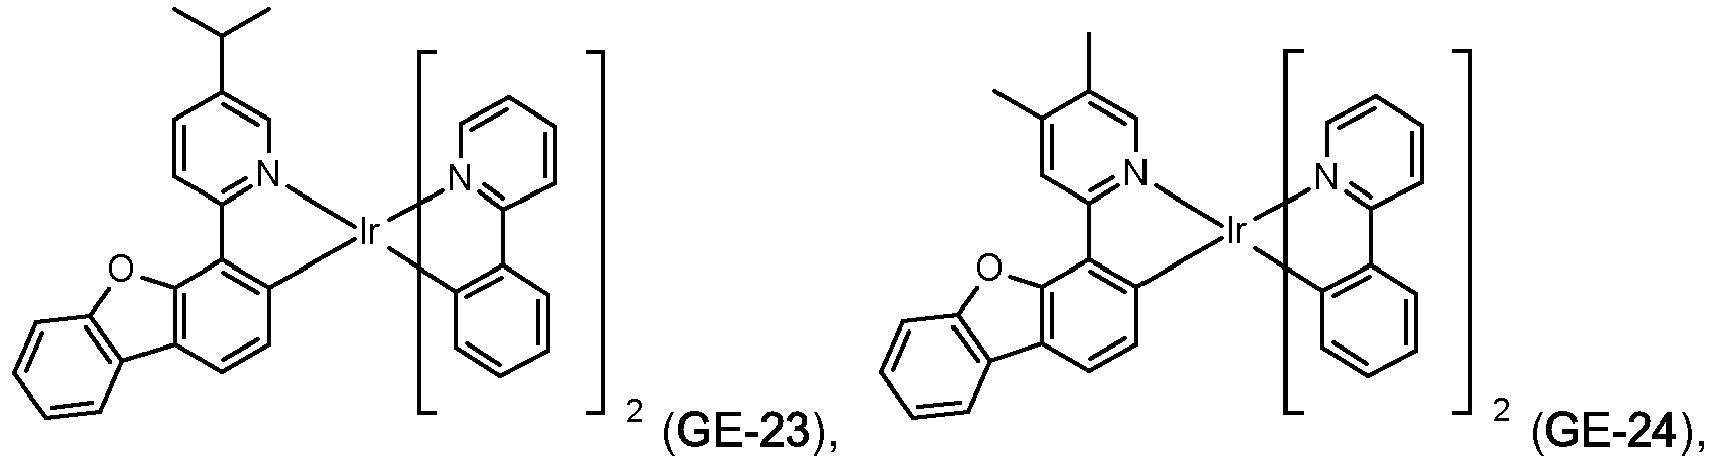 Figure imgb0819